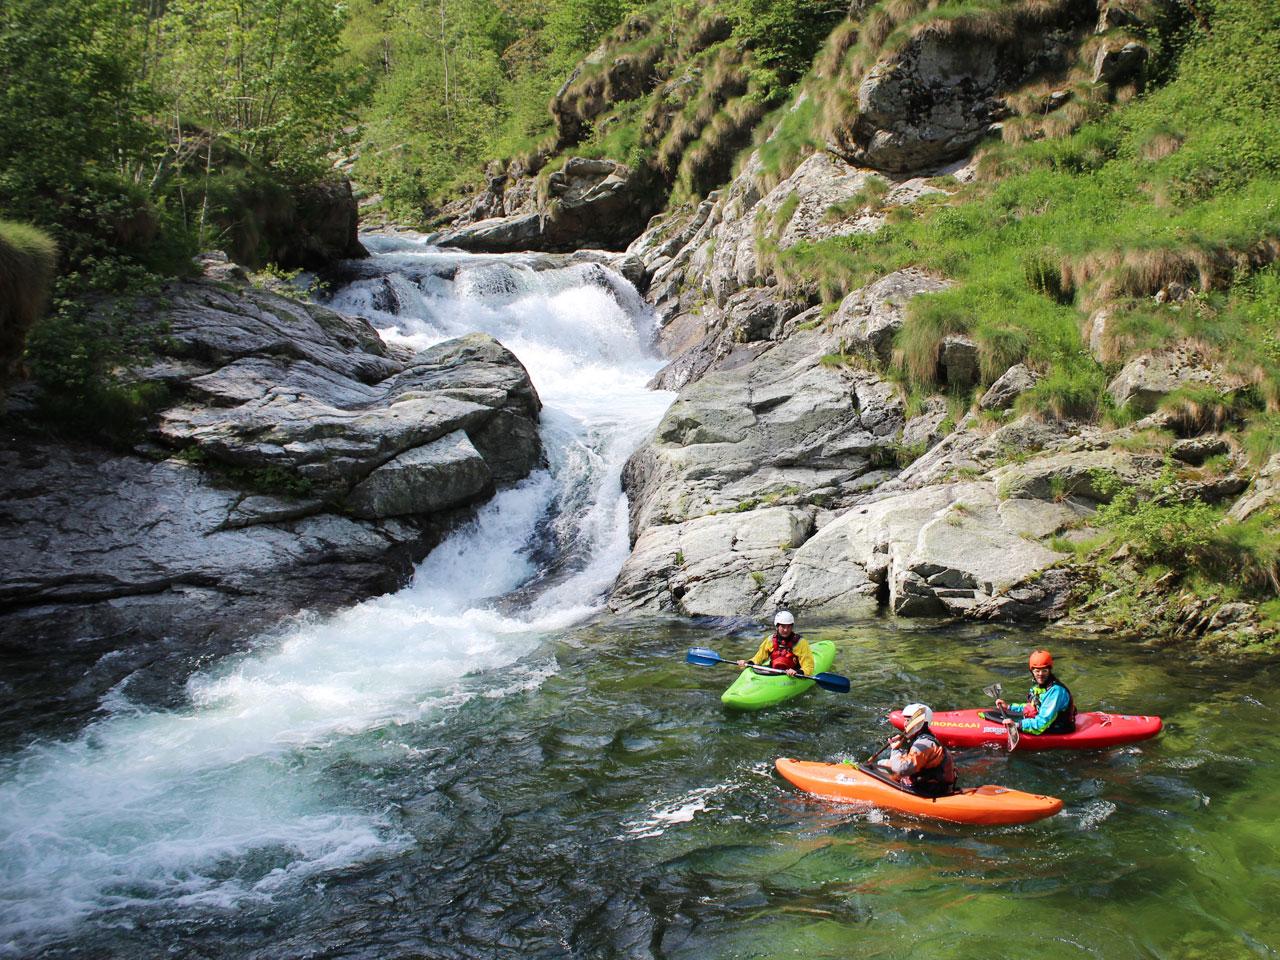 Wildwaterkajakken op de Sesia, Sorba, Gronda & Ribo in Italië.